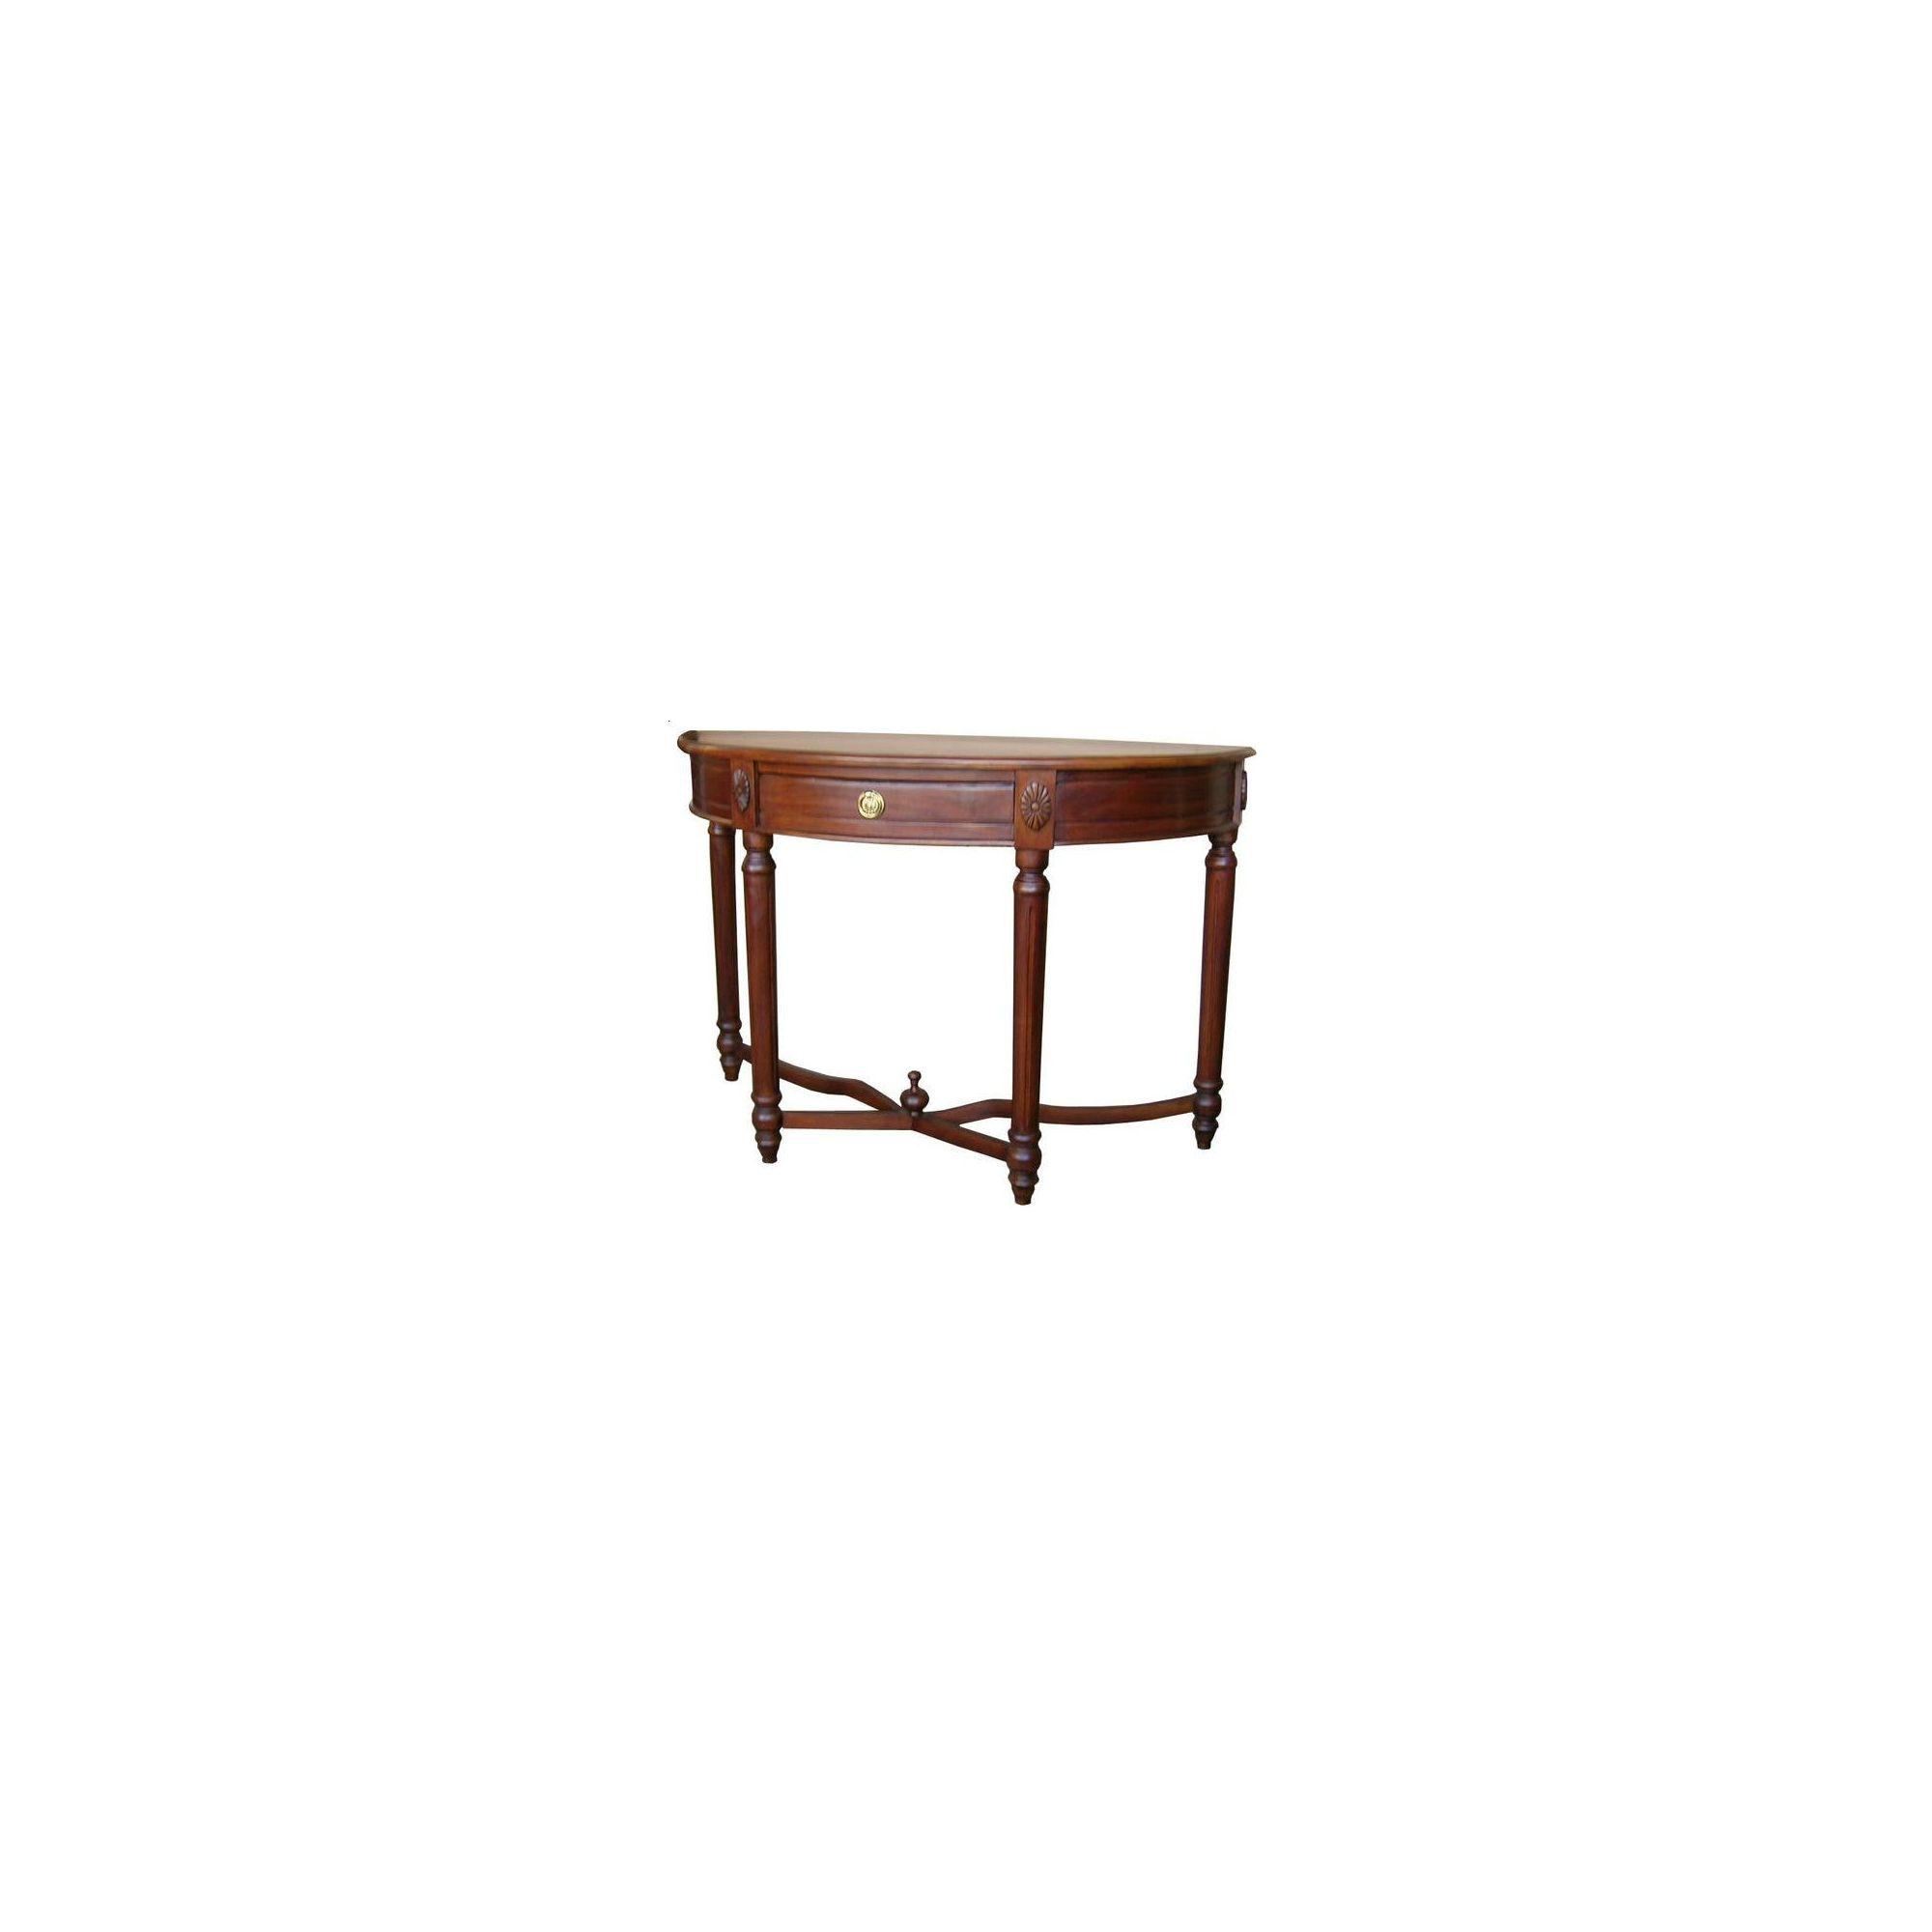 Lock stock and barrel Mahogany Regency Demi Lune Console Table in Mahogany at Tesco Direct